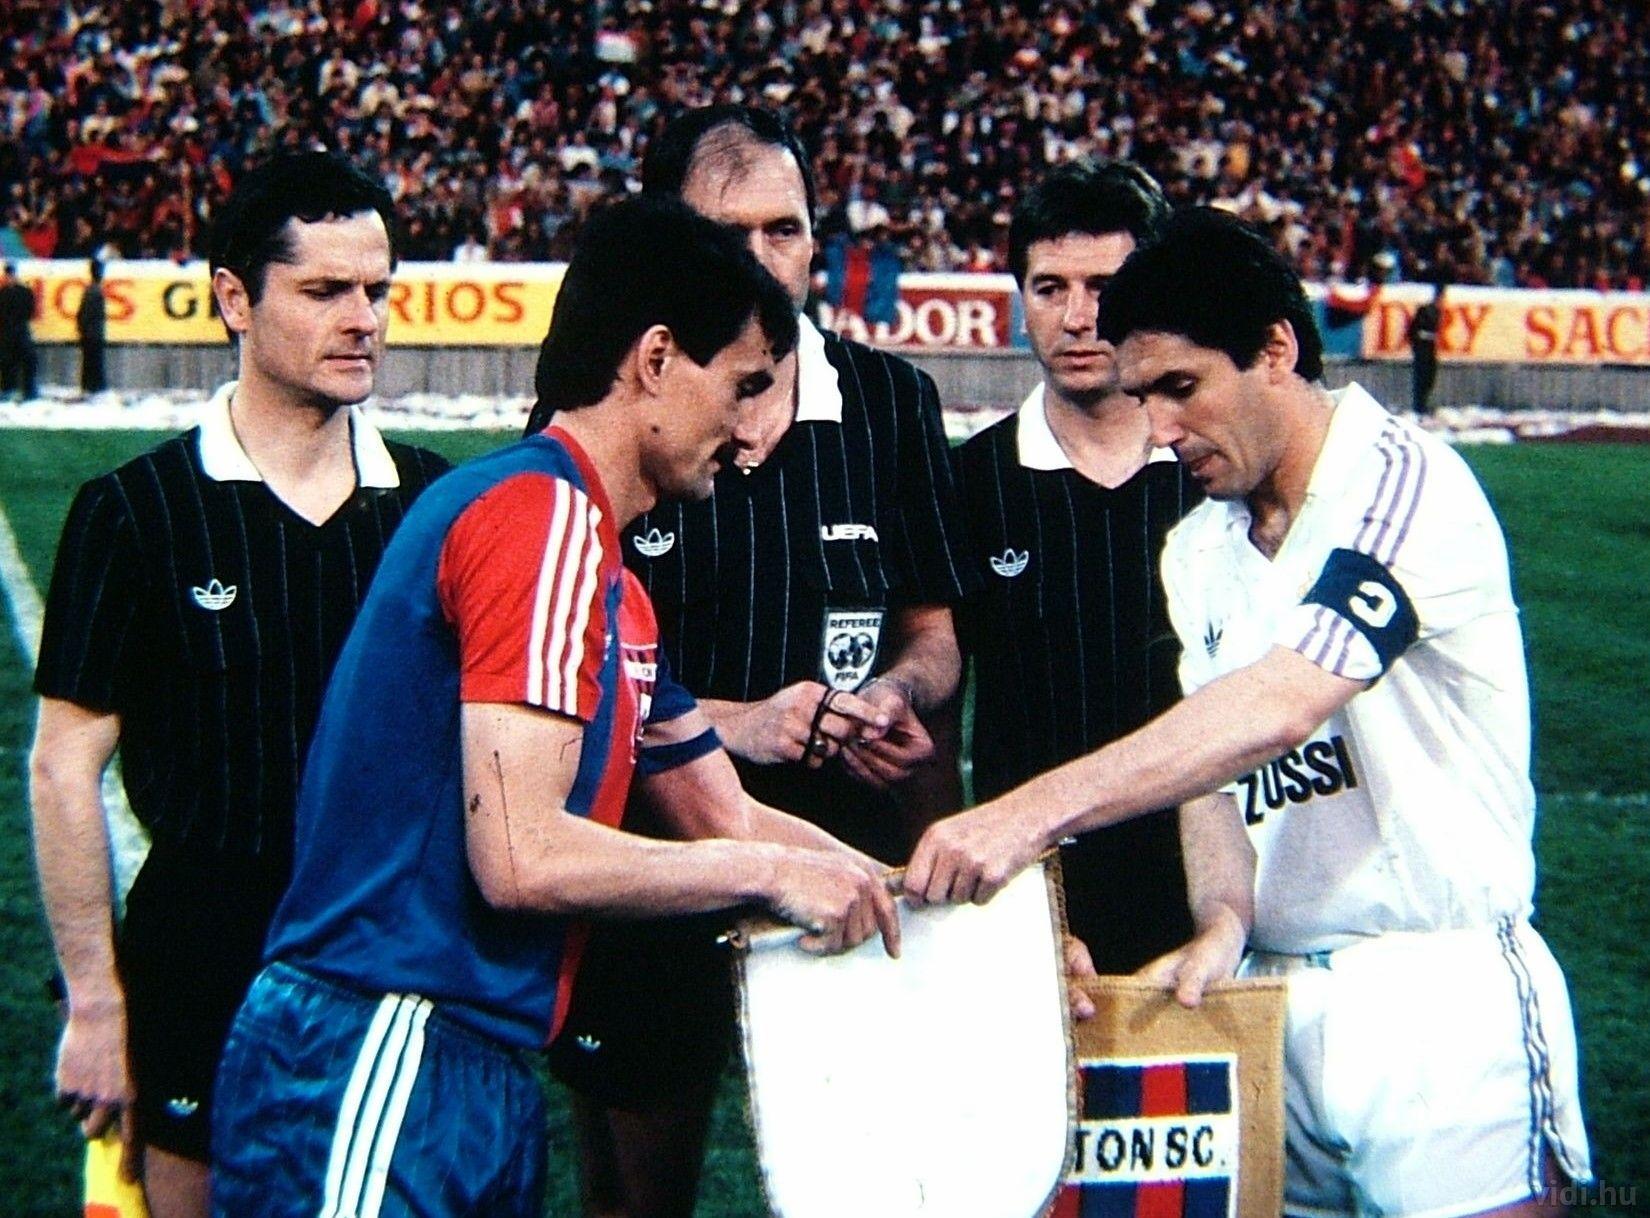 osztalynaplo_Vegh_Tibor_UEFA.jpg